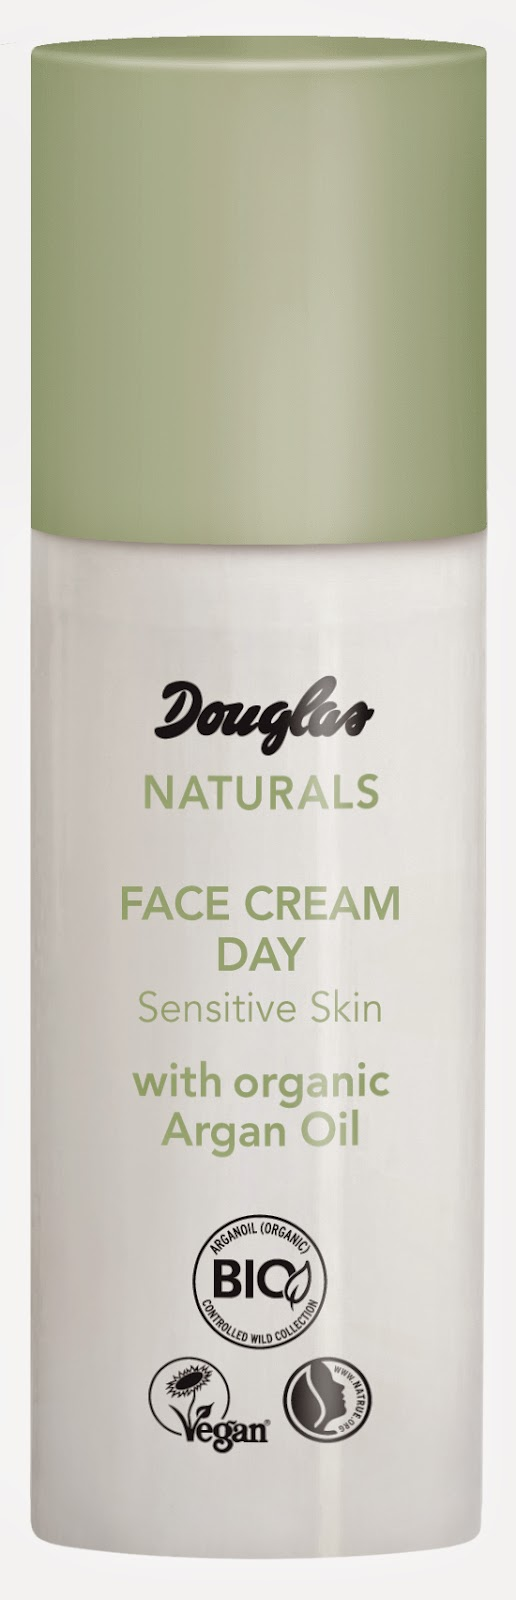 Douglas Naturals Day Cream Sensitive Skin